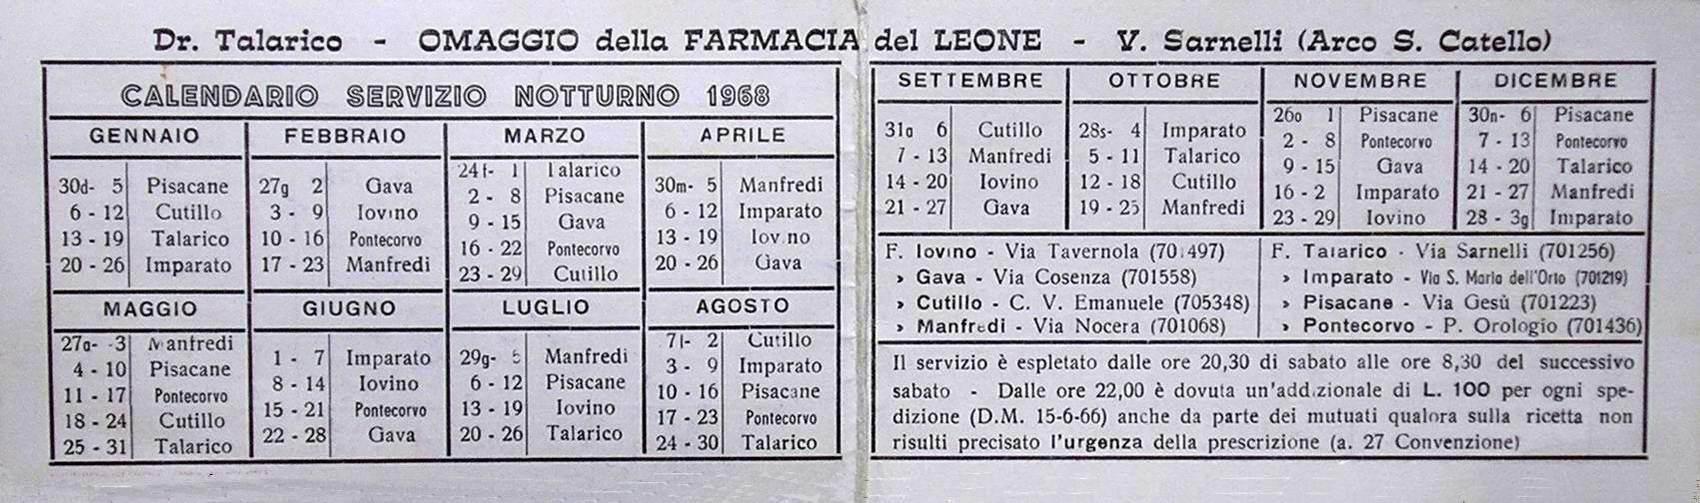 Farmacie stabiesi di turno nel 1968